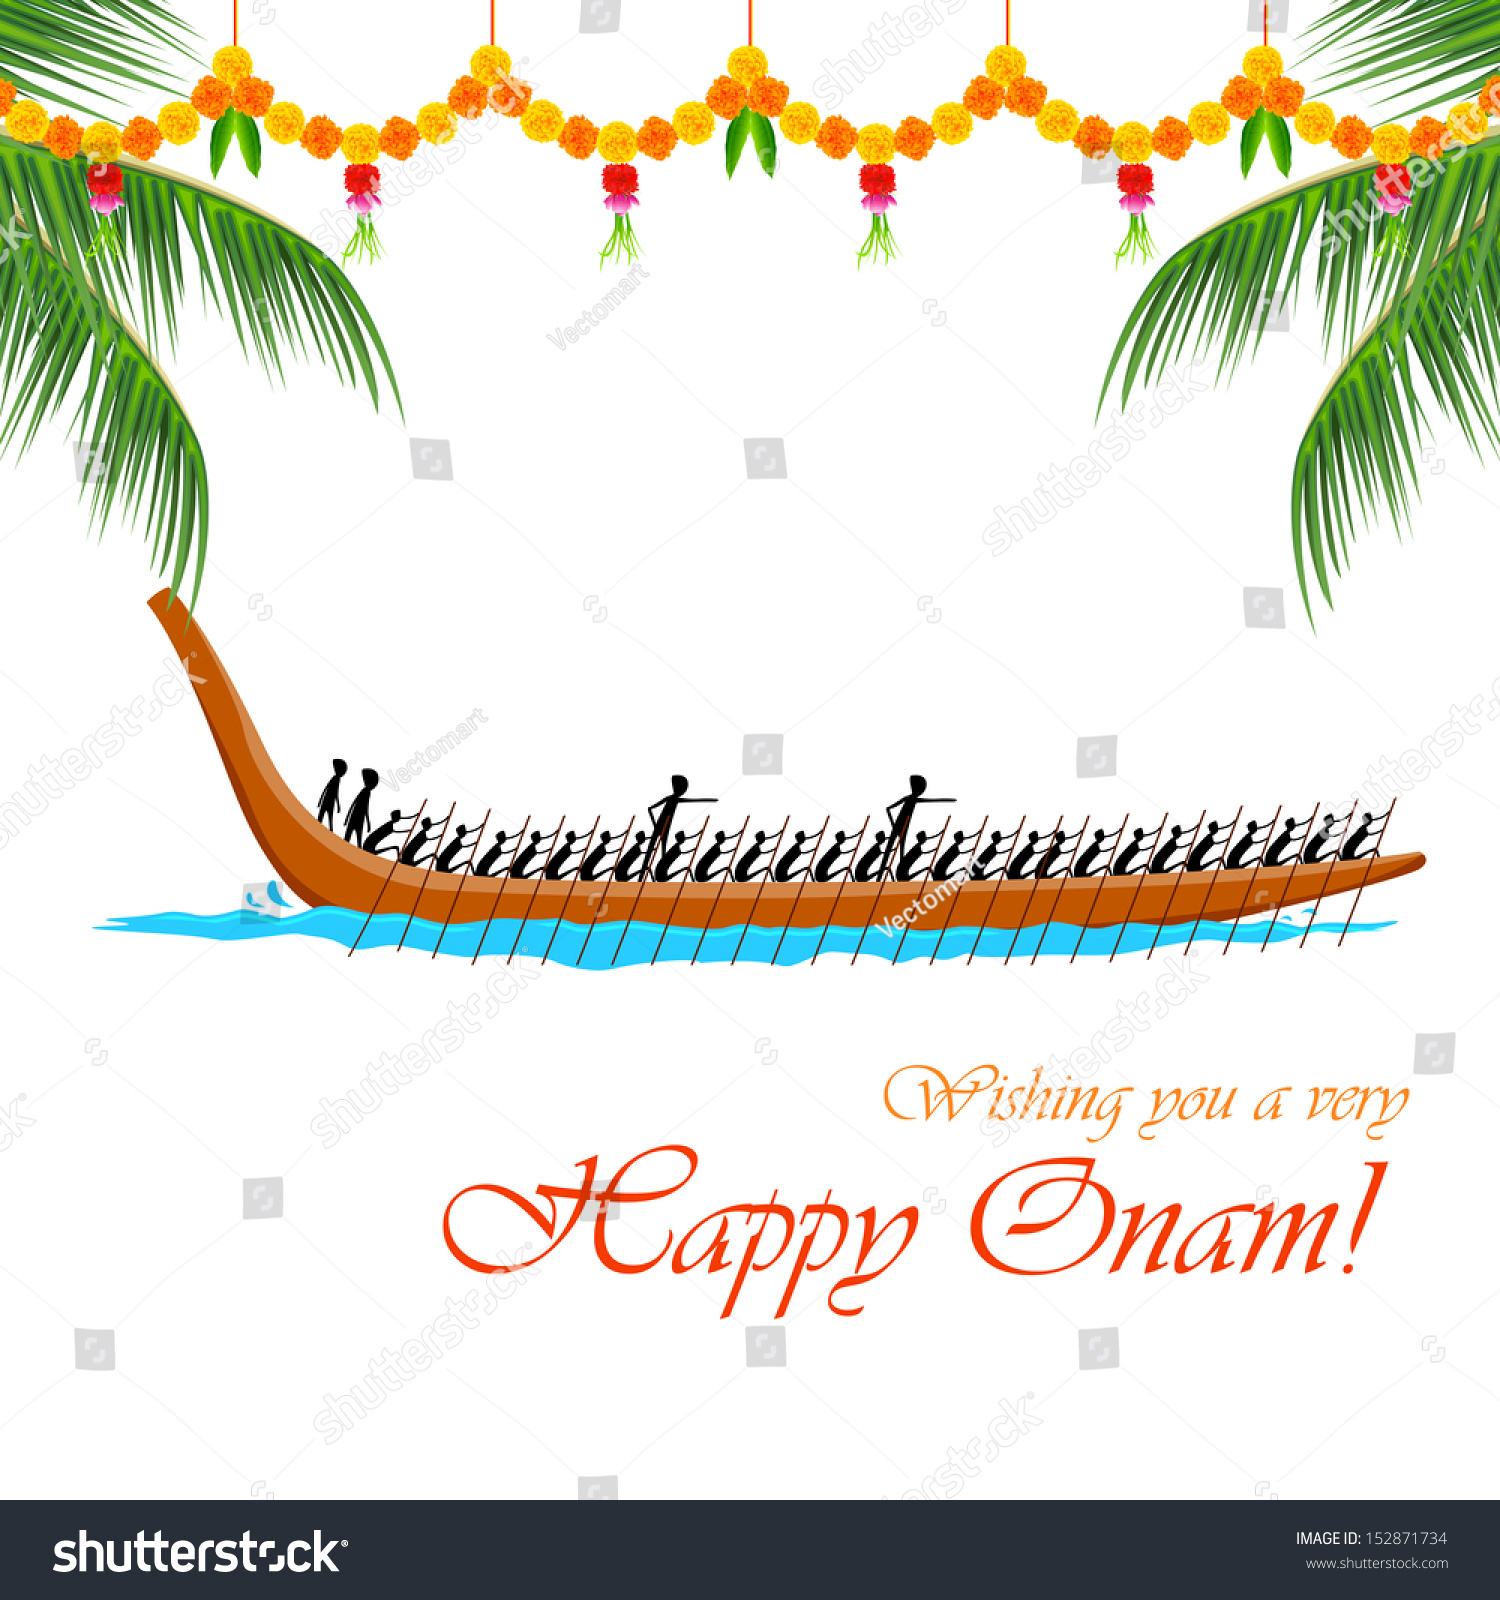 Onam Festival Boat Race PNG - 77233